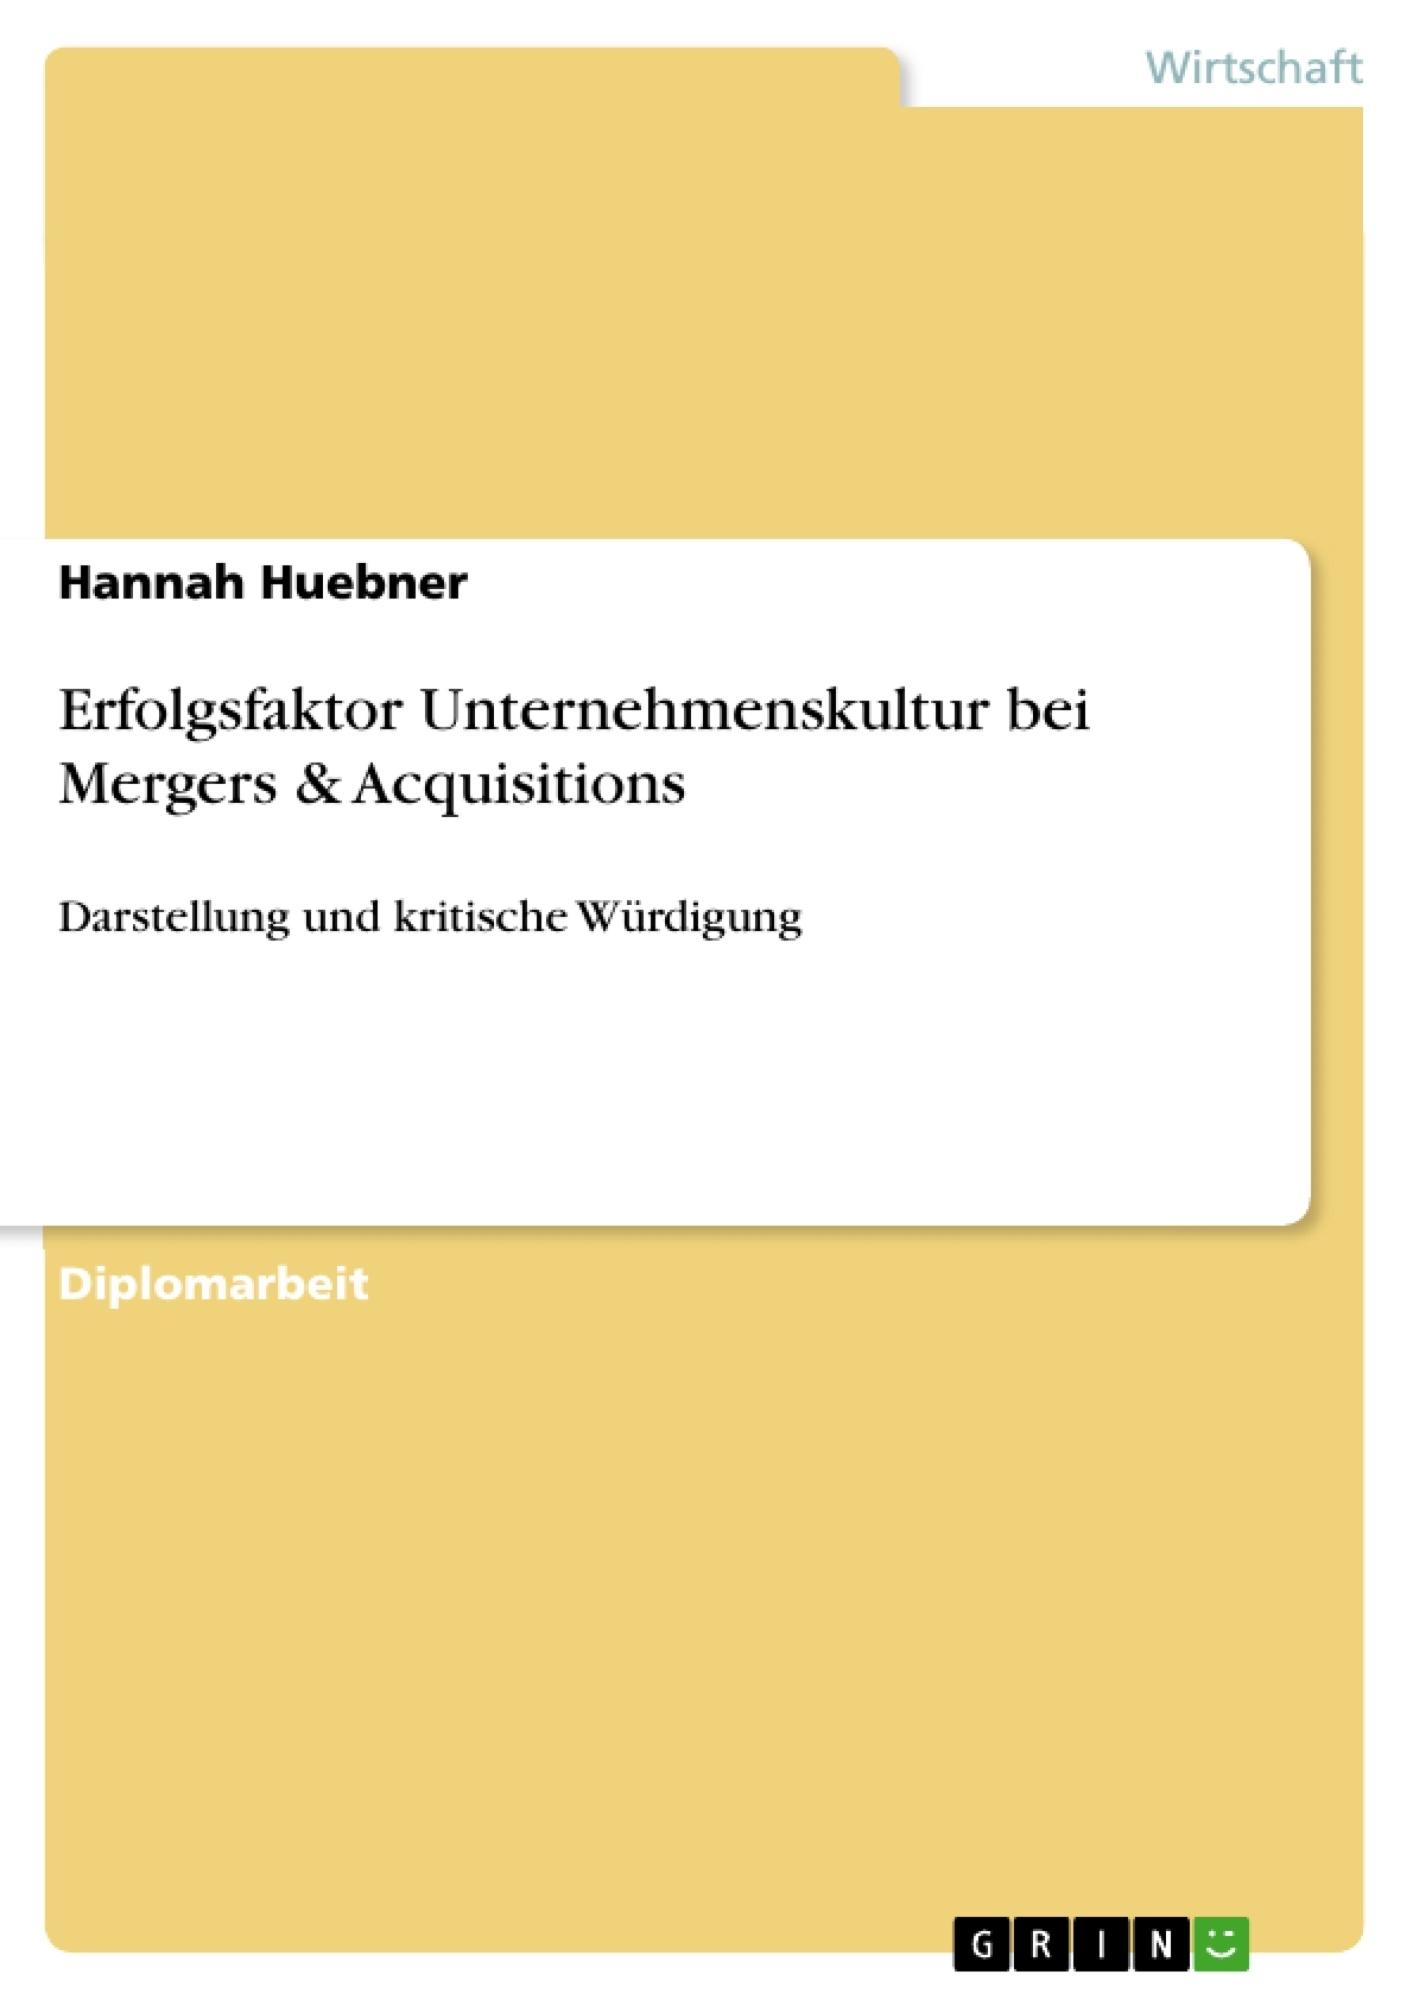 Titel: Erfolgsfaktor Unternehmenskultur bei Mergers & Acquisitions